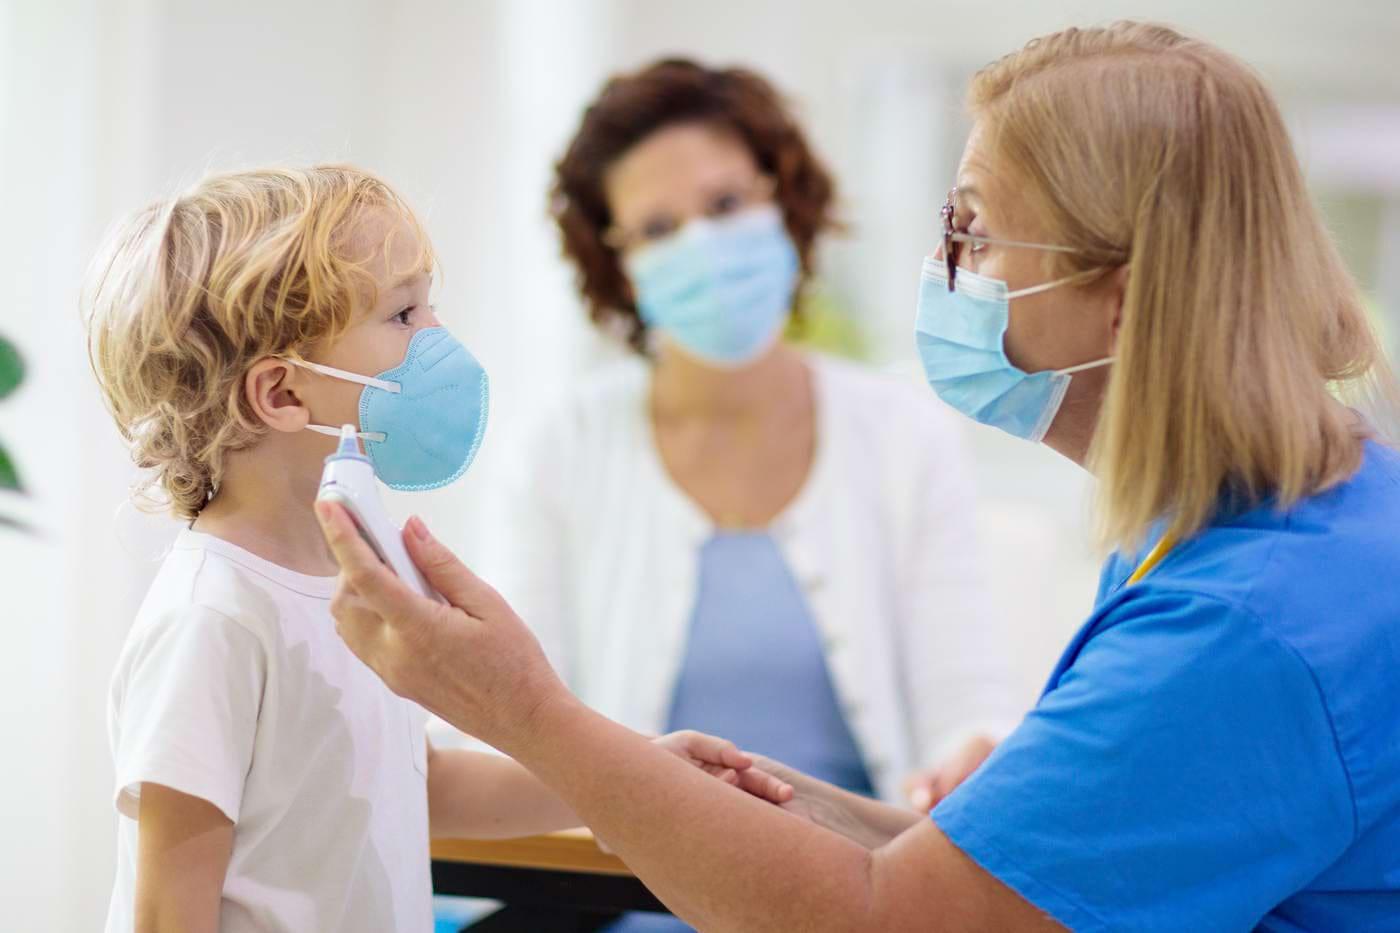 COVID-19: Copiii produc anticorpi diferiți ca răspuns la SARS-CoV-2 [studiu]